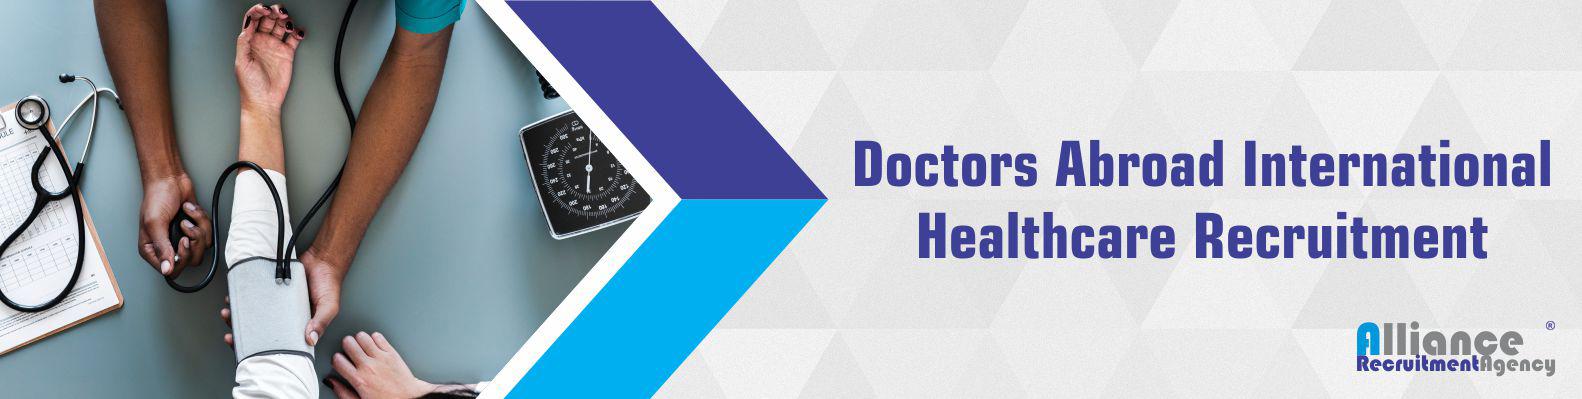 Doctors Abroad International Healthcare Recruitment